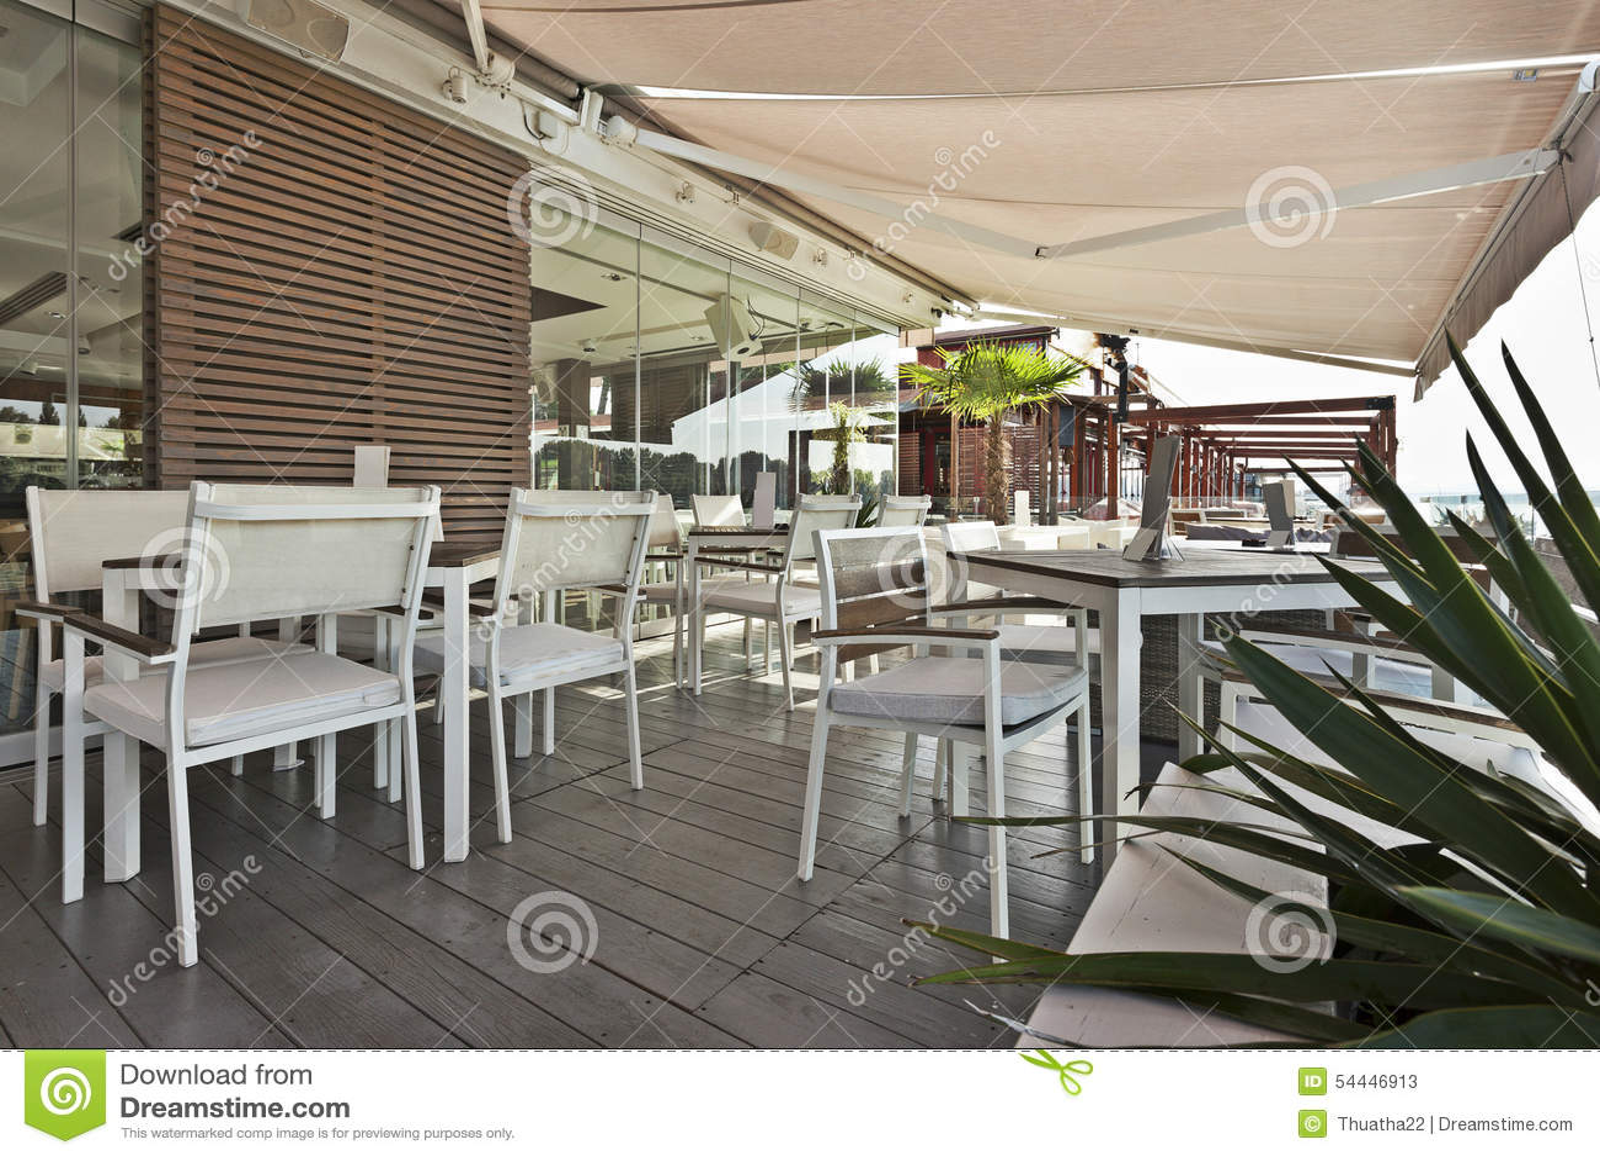 Modern riverside cafe terrace in the morning